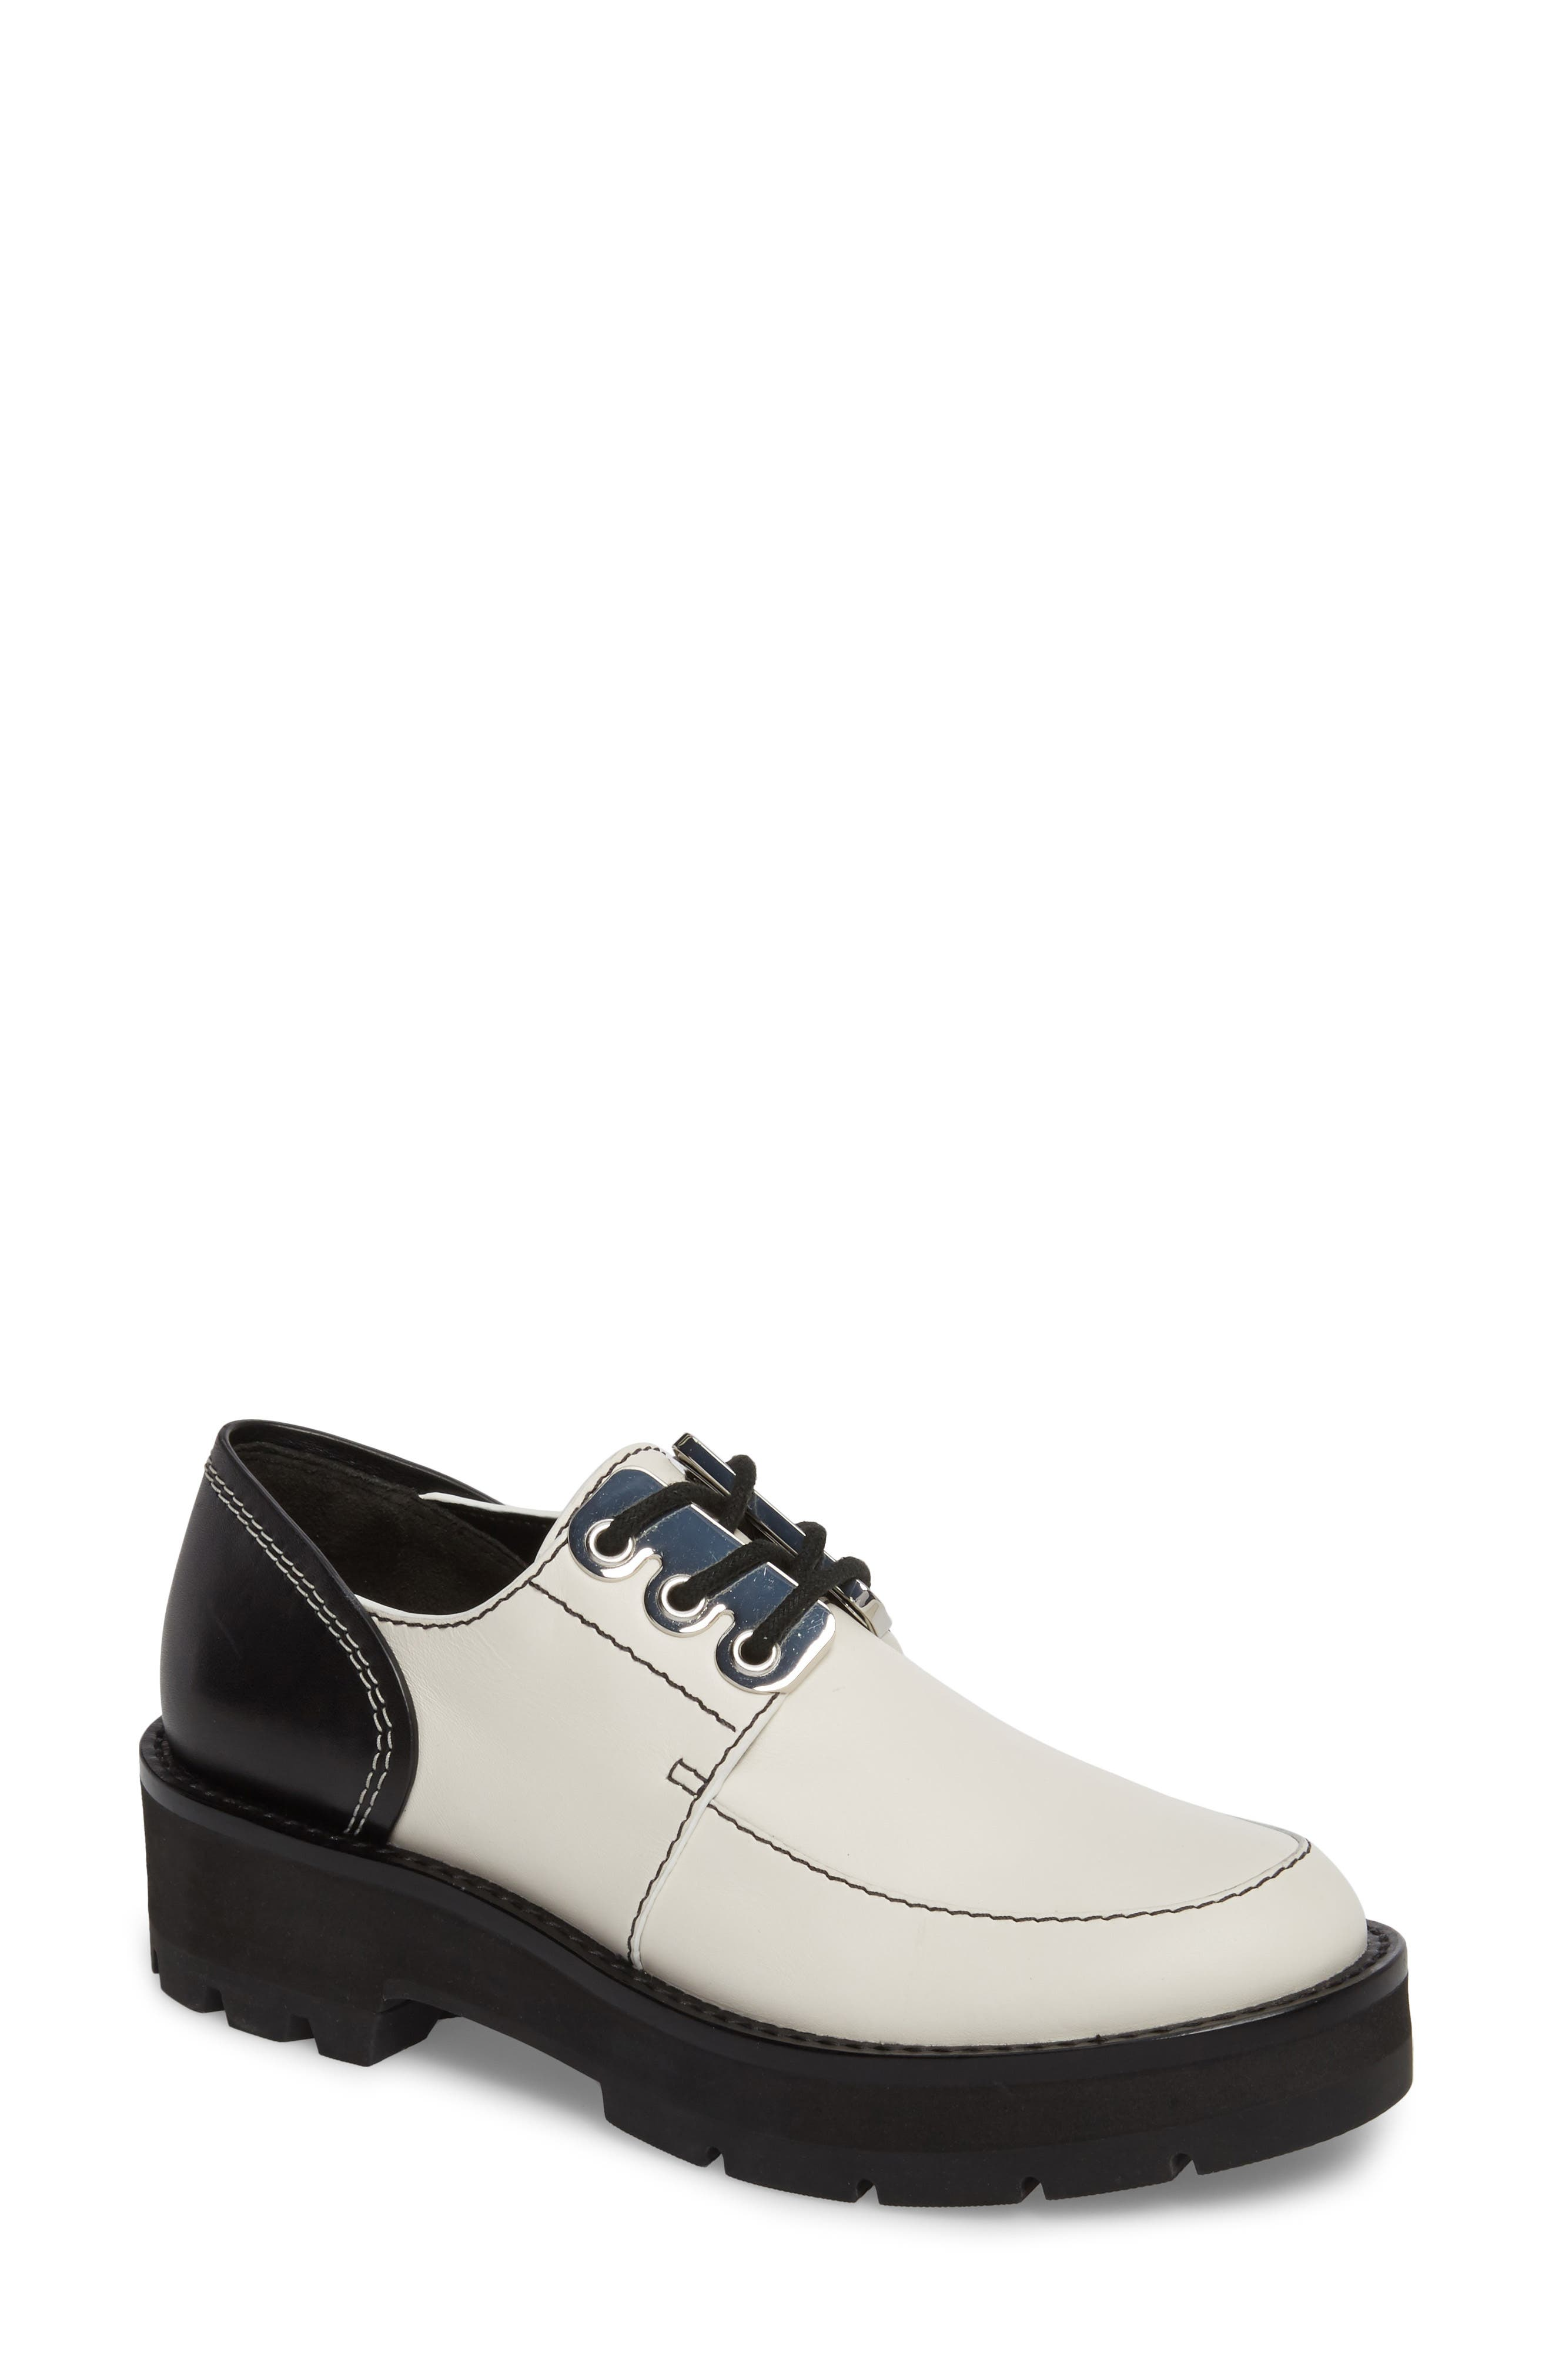 Cat Loafer,                         Main,                         color, White-Black